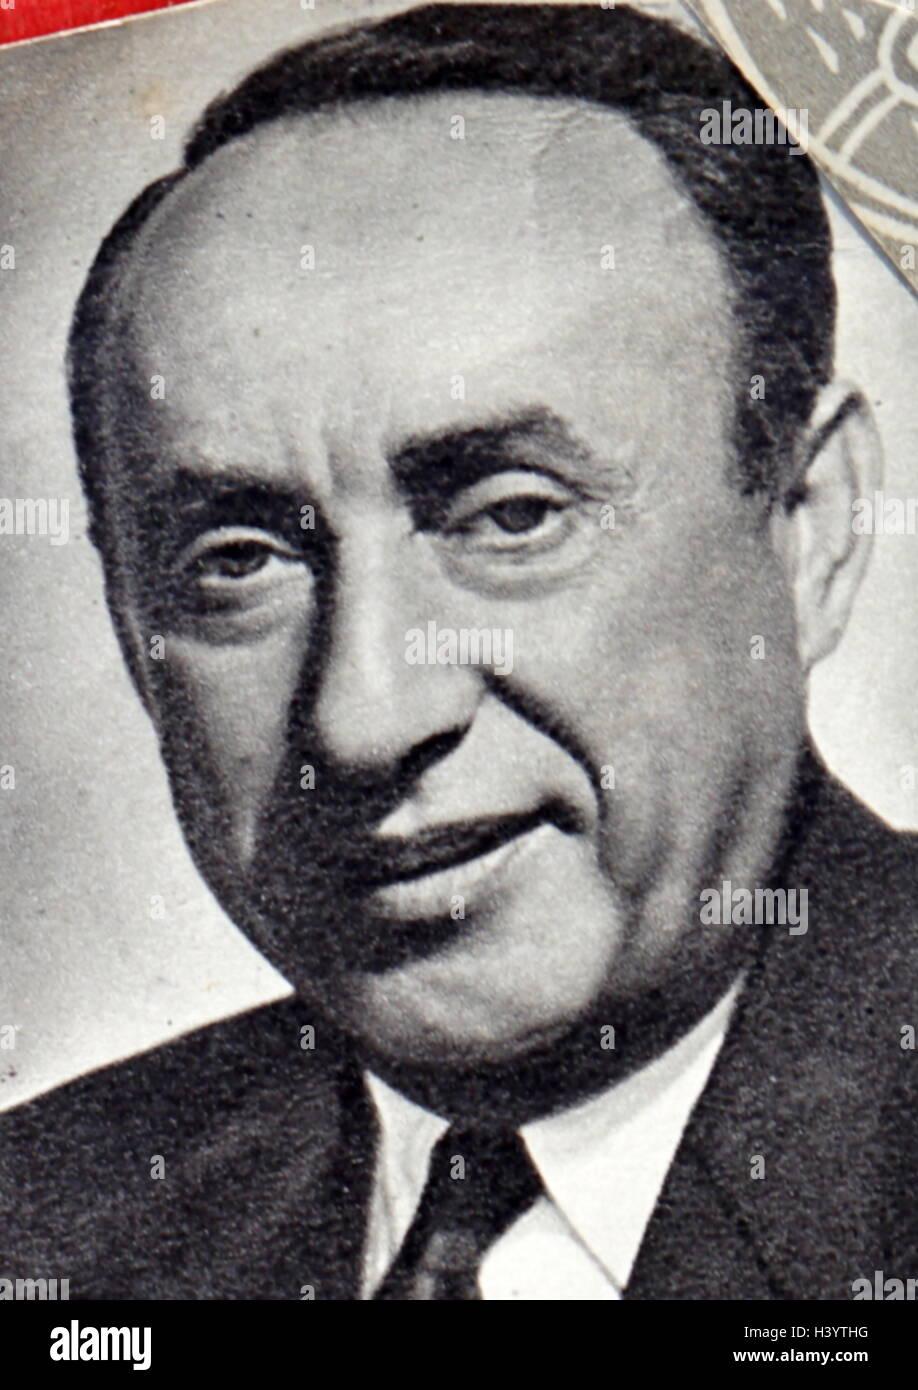 Photograph of Joe Pasternak (1901-1991) a Hungarian-born American film producer. Dated 20th Century - Stock Image